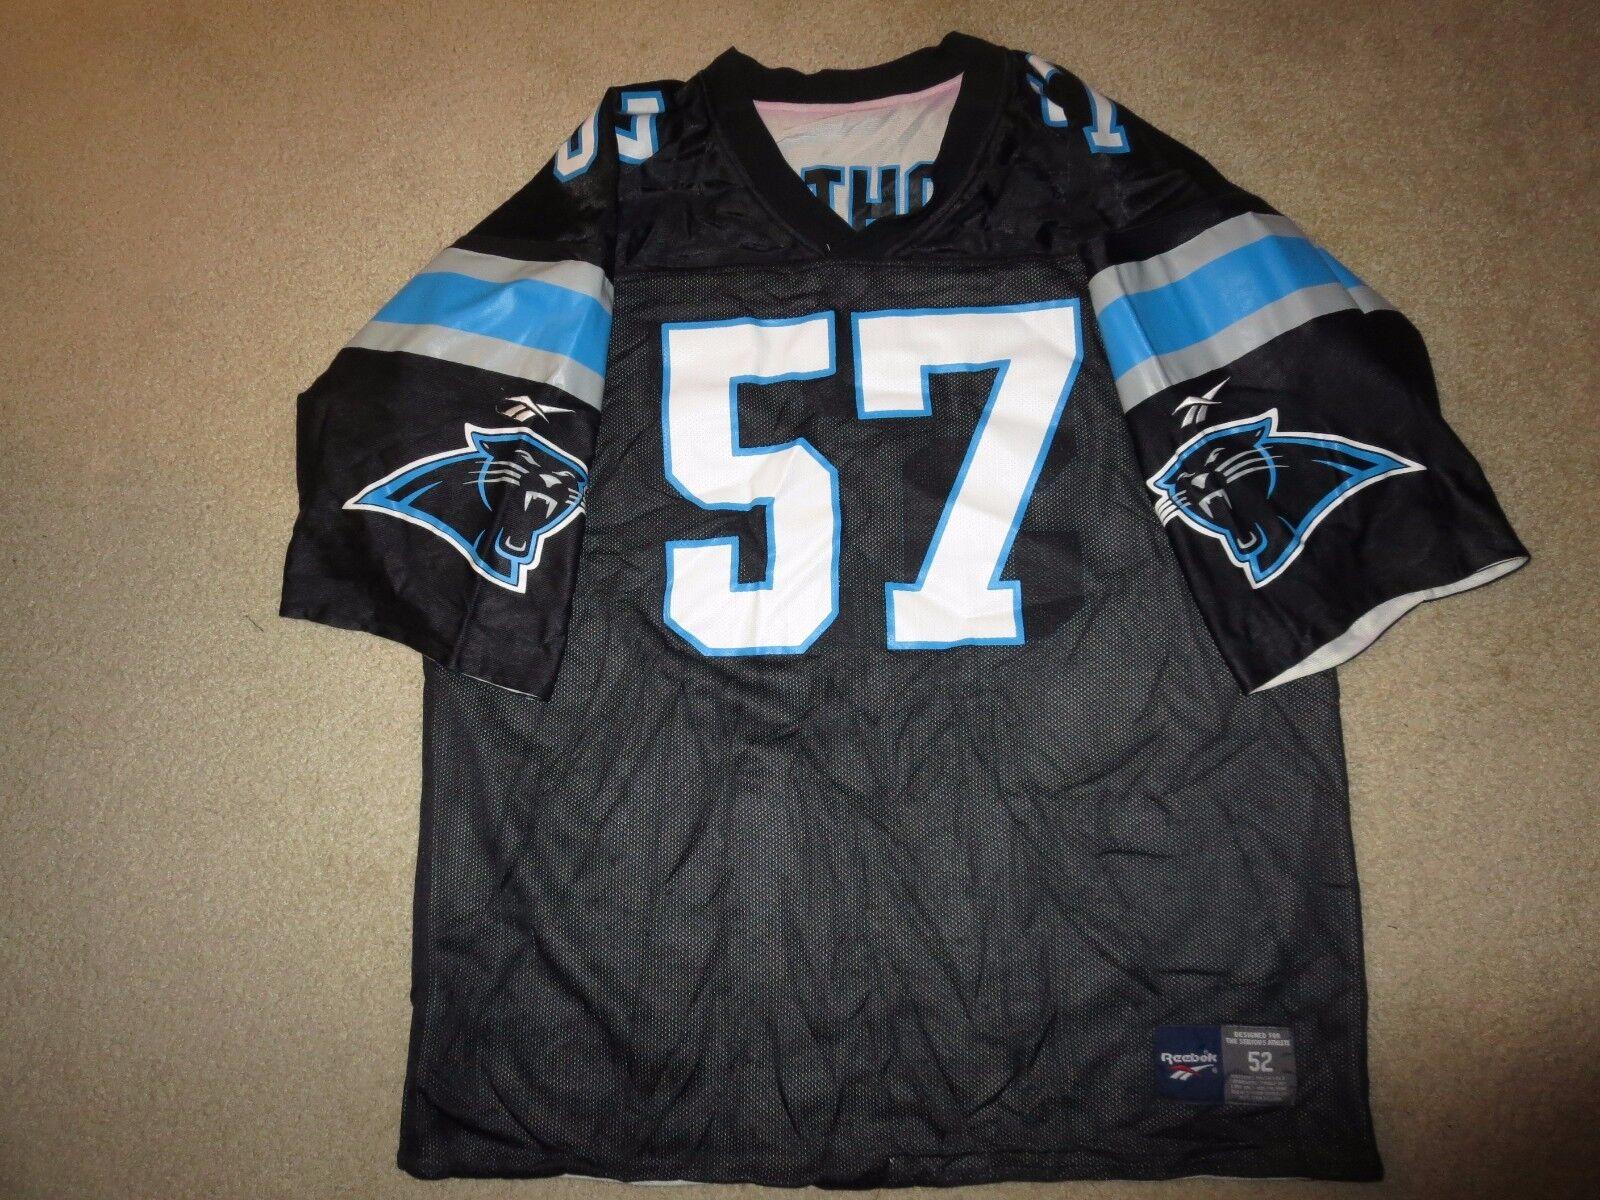 Carolina Panthers  57 Lathon NFL Negro Reebok Camiseta 52 XL